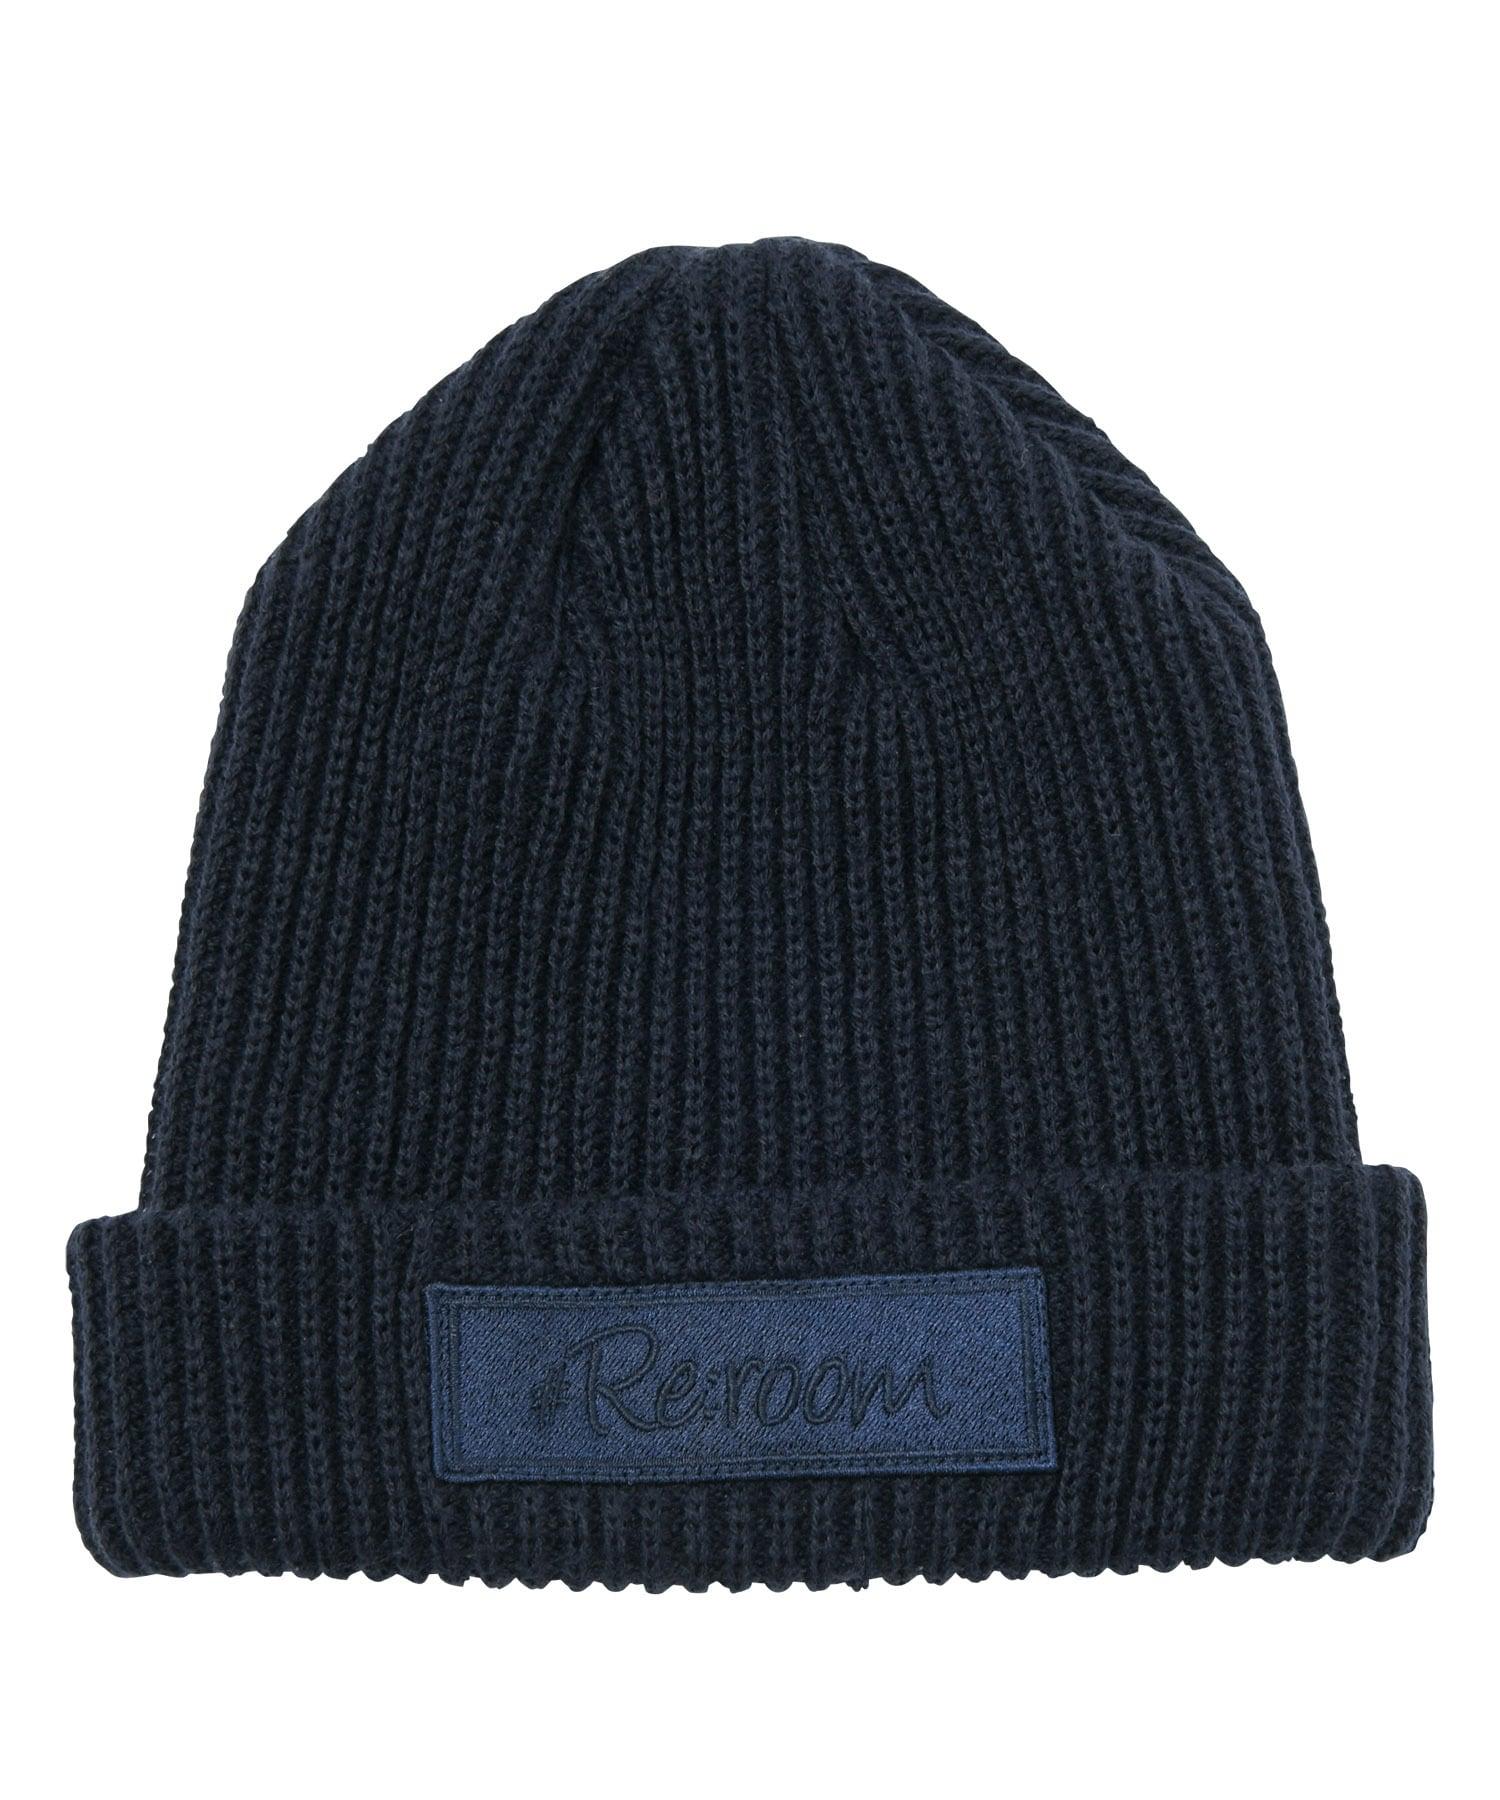 BOX LOGO KNIT CAP[REH116]